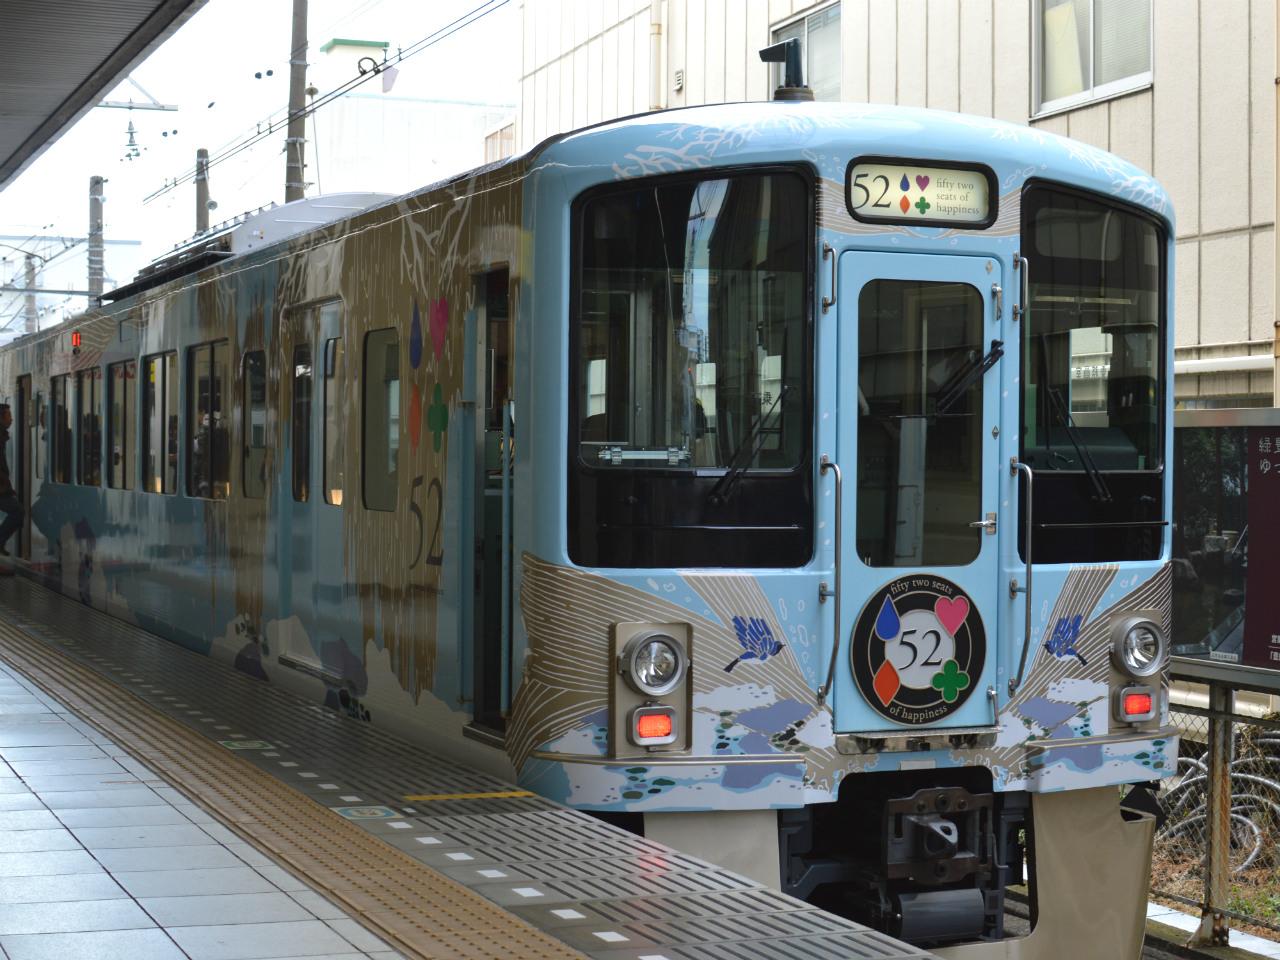 観光電車「52席の至福」